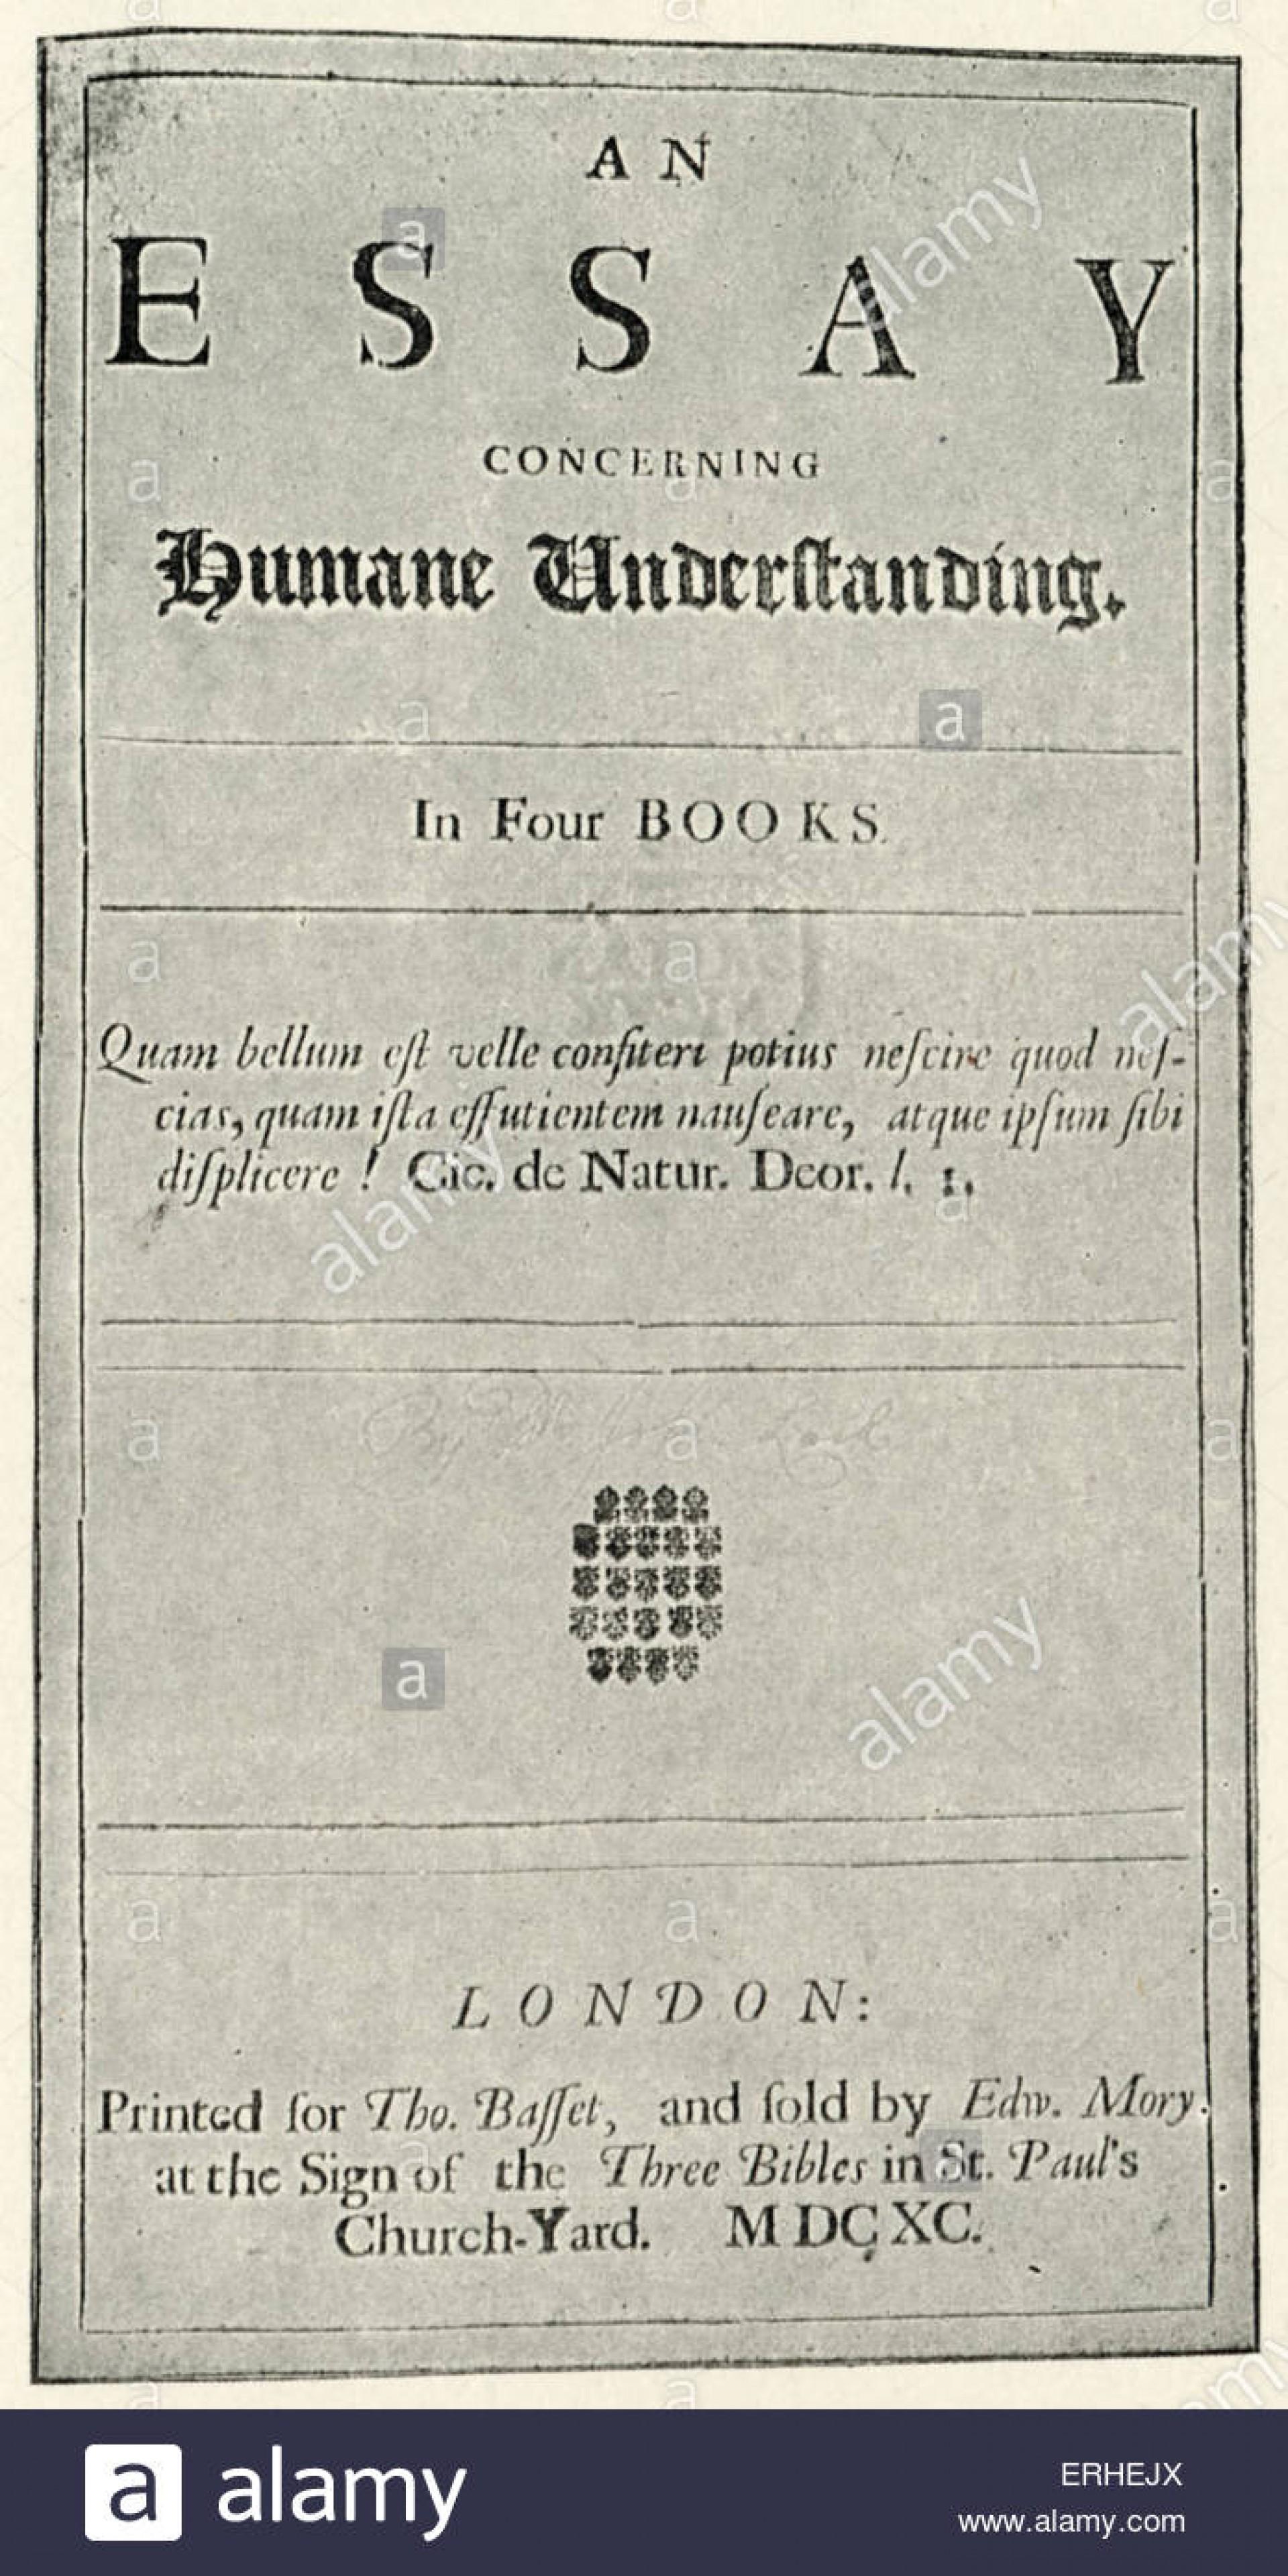 009 Essay Example John Locke Titlepage To His On Humane Understanding English Impressive Concerning Human Book 4 Pdf Summary 1920